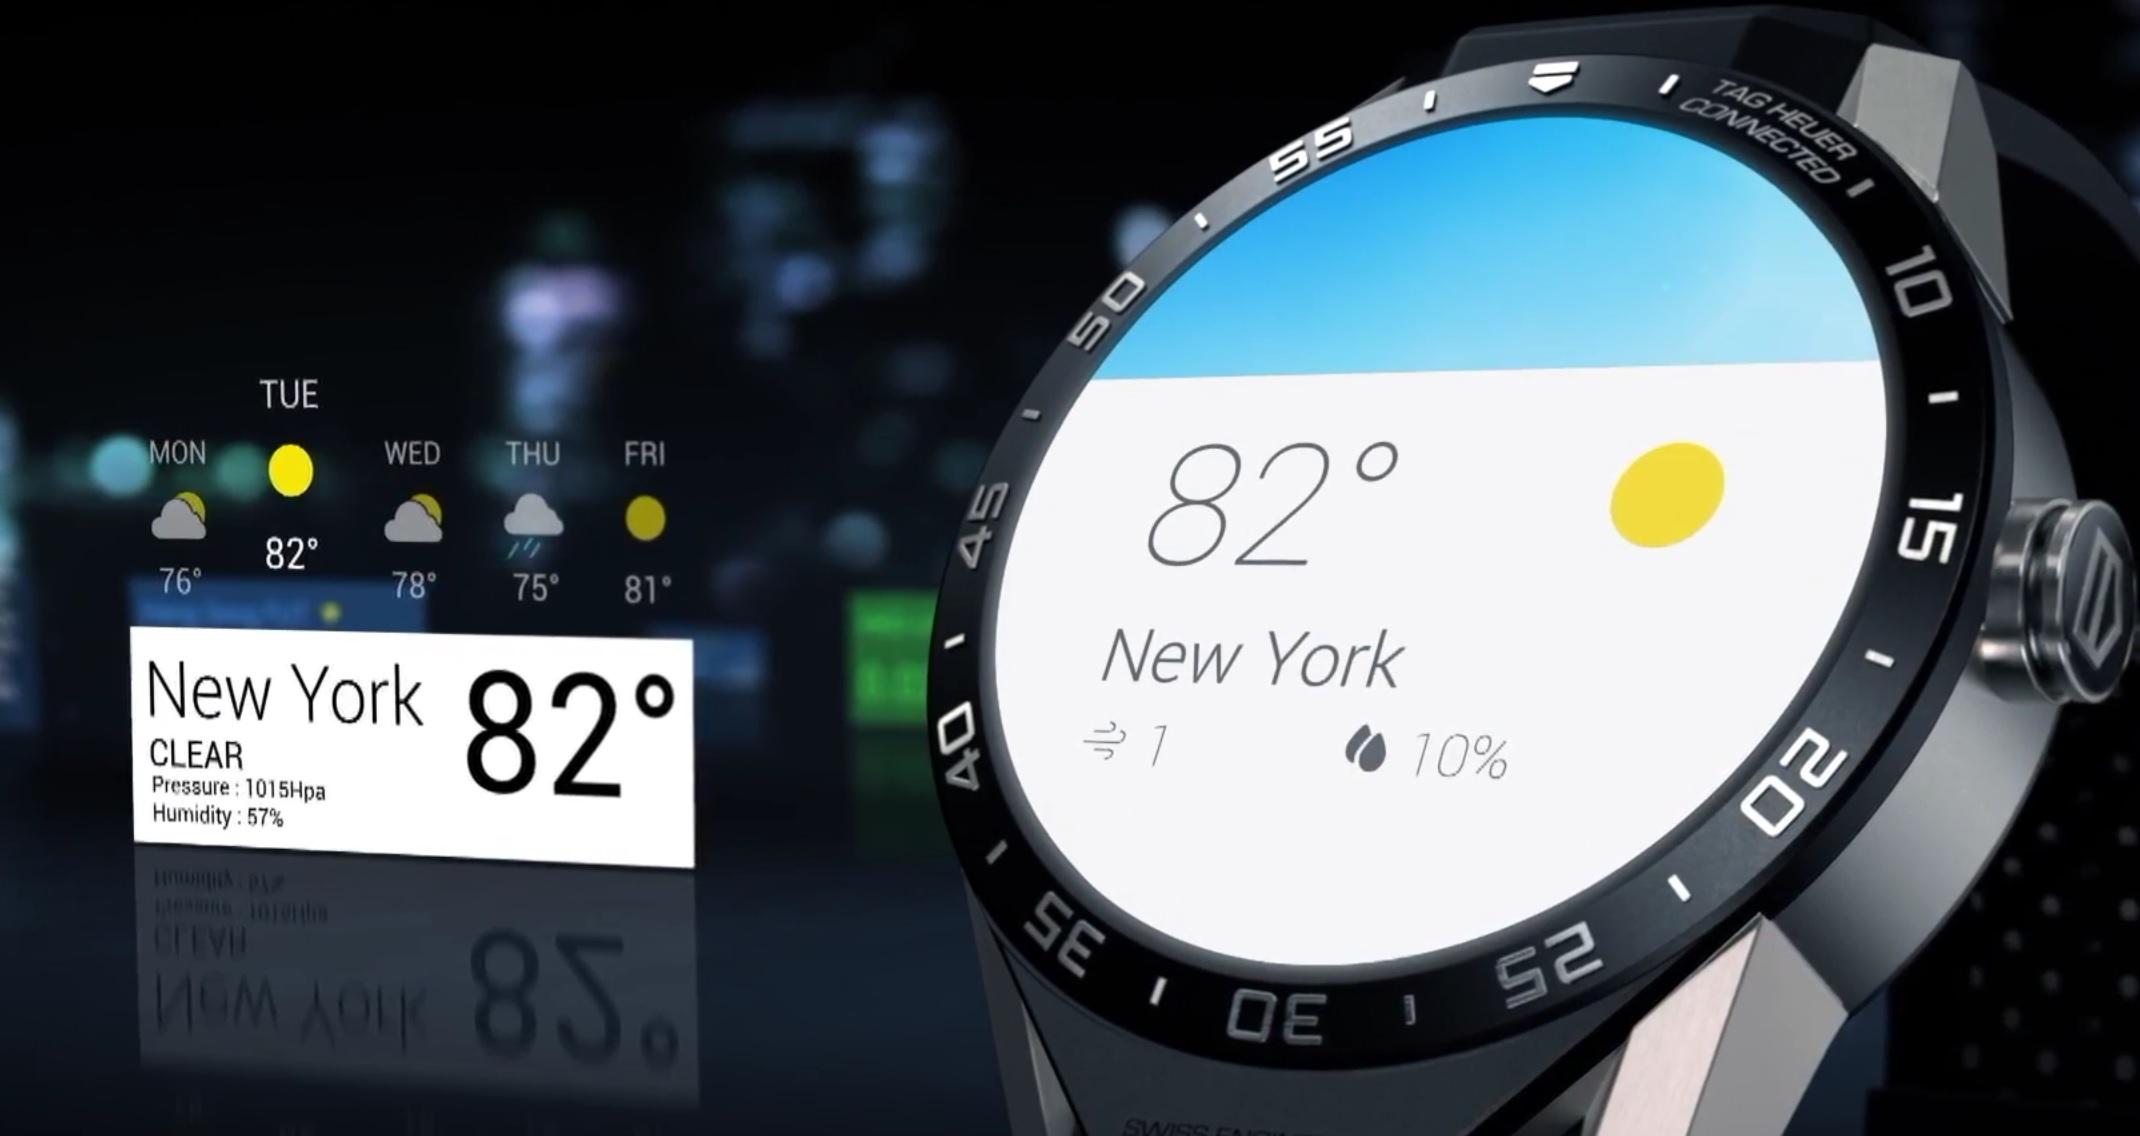 Tag Heuers 13 000 kroners klokke kjører Android Wear.